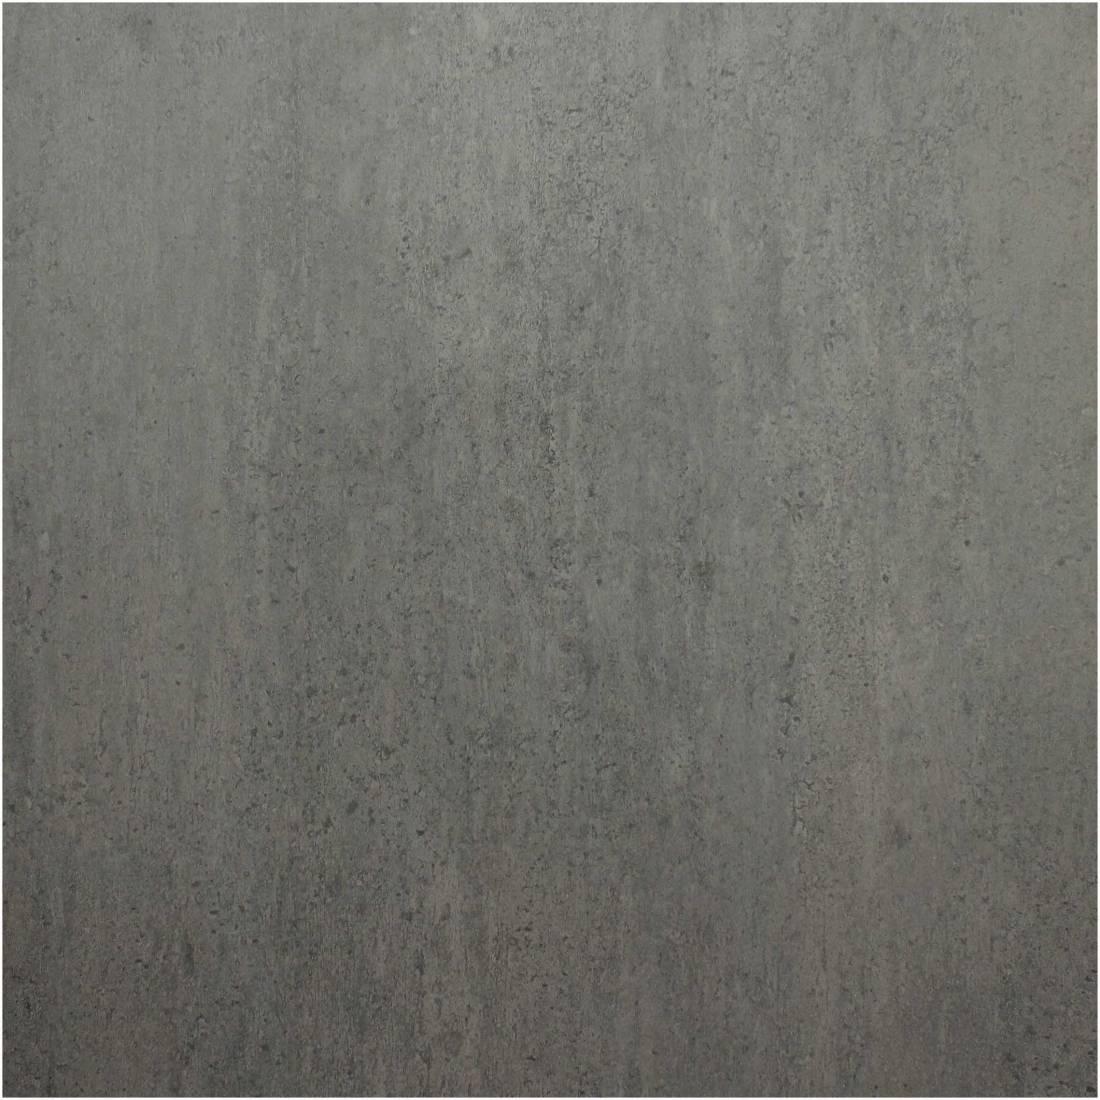 Cement No7 60x60 Black Matt 1